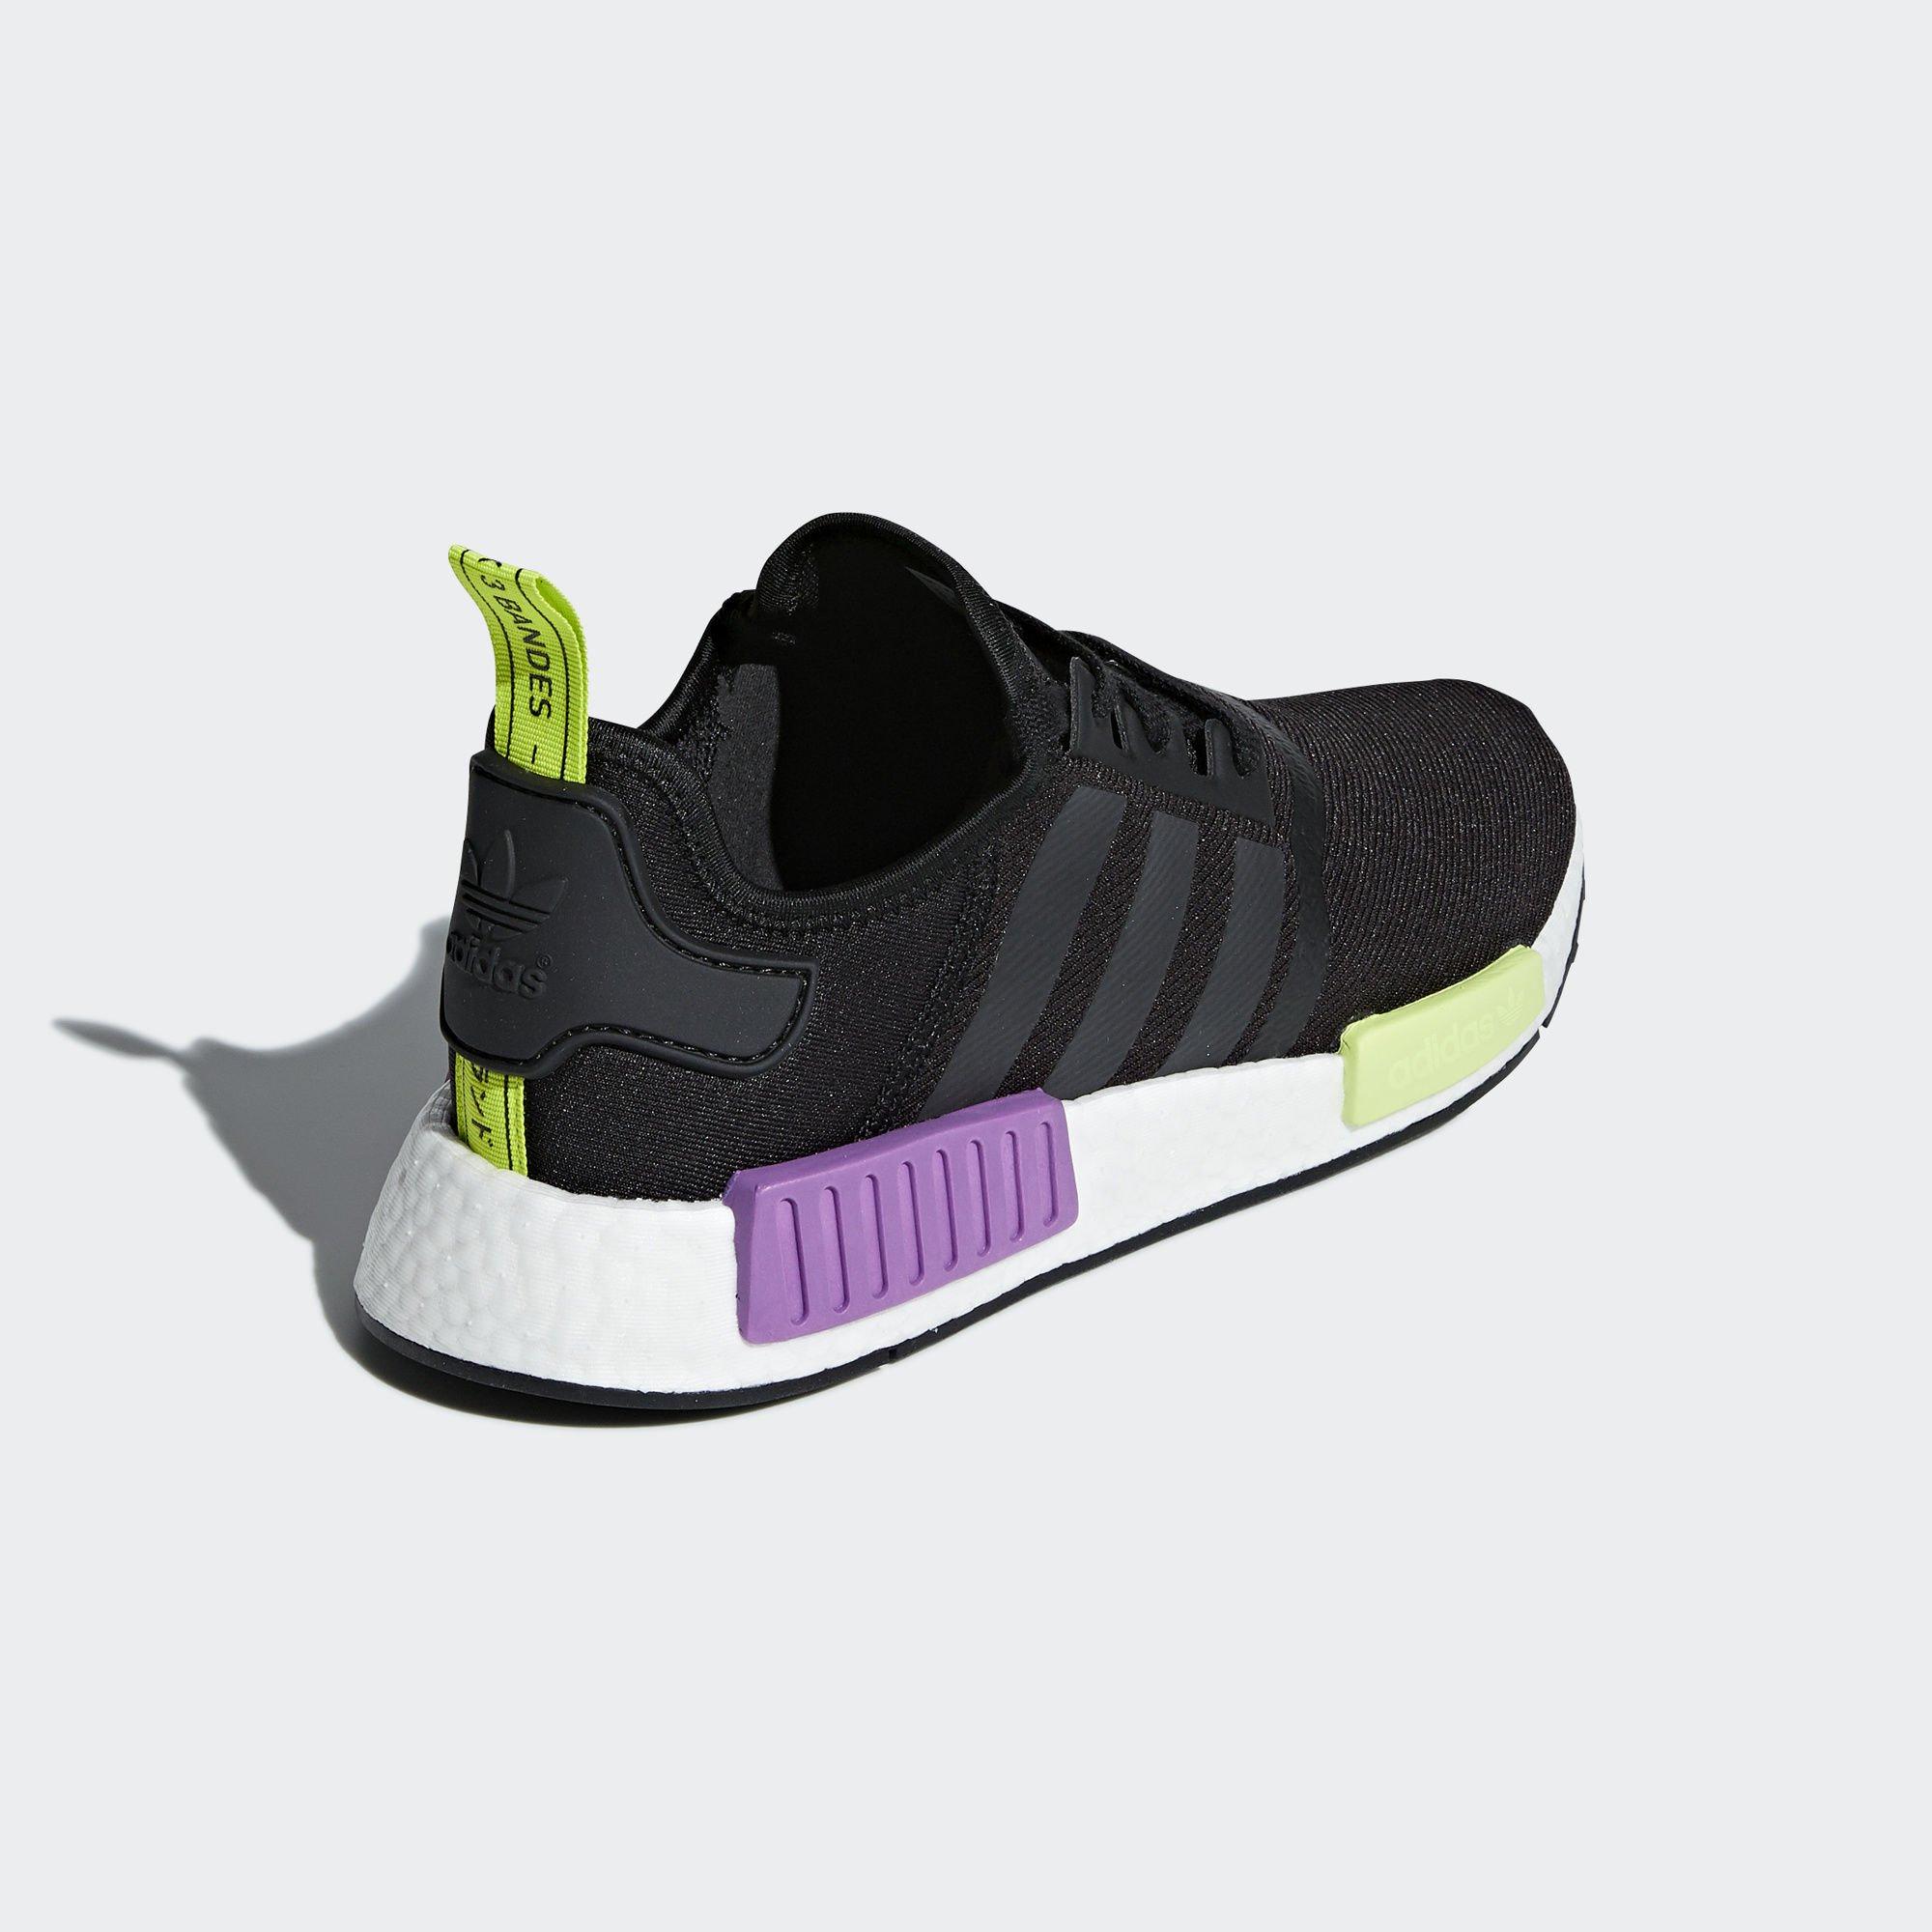 adidas NMD_R1 'Black/Purple Shot' (D96627)